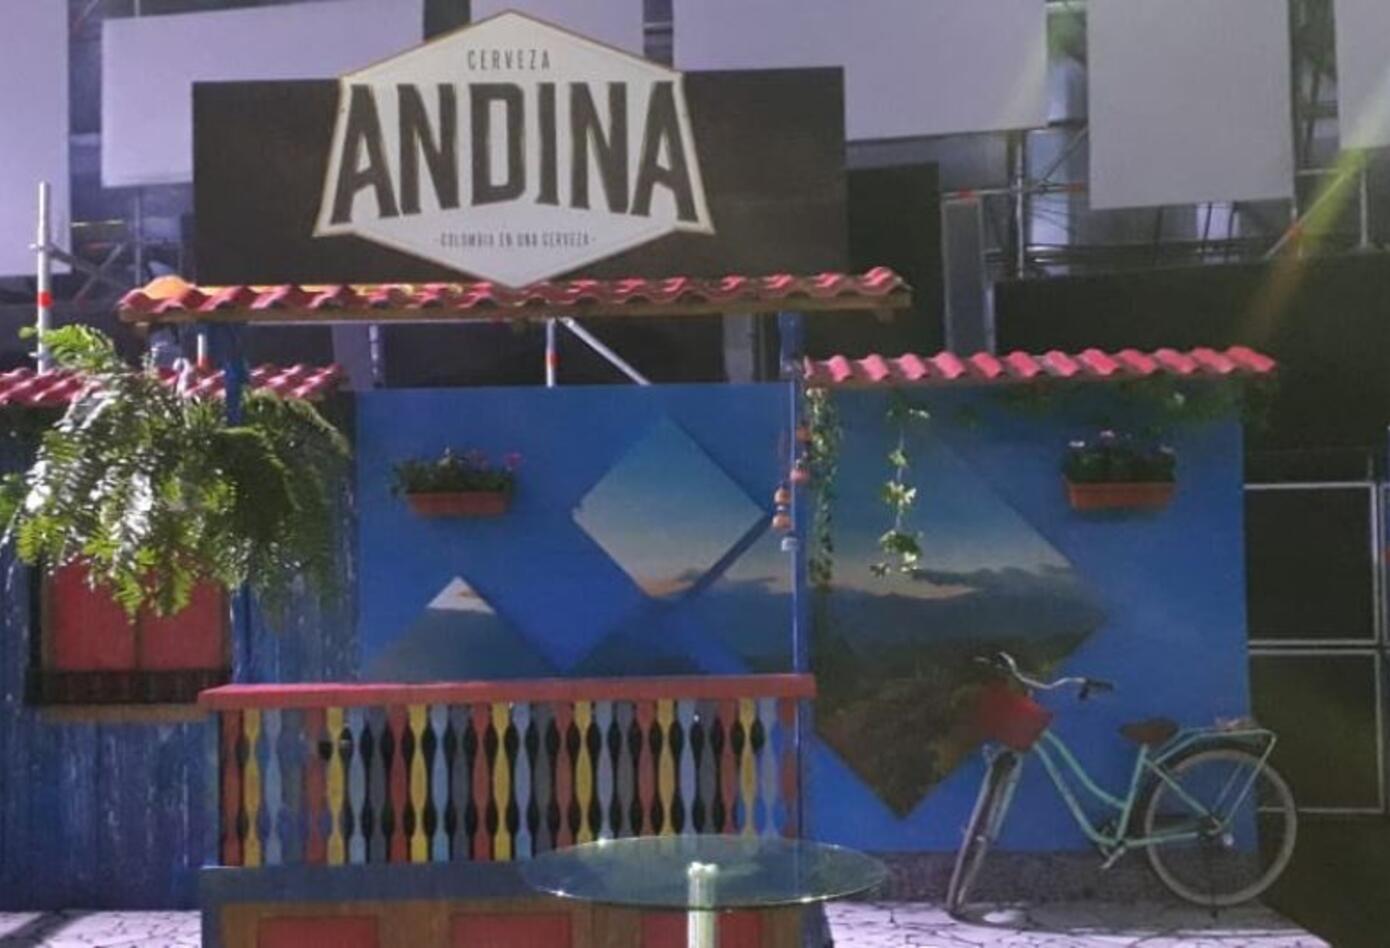 Andina 3